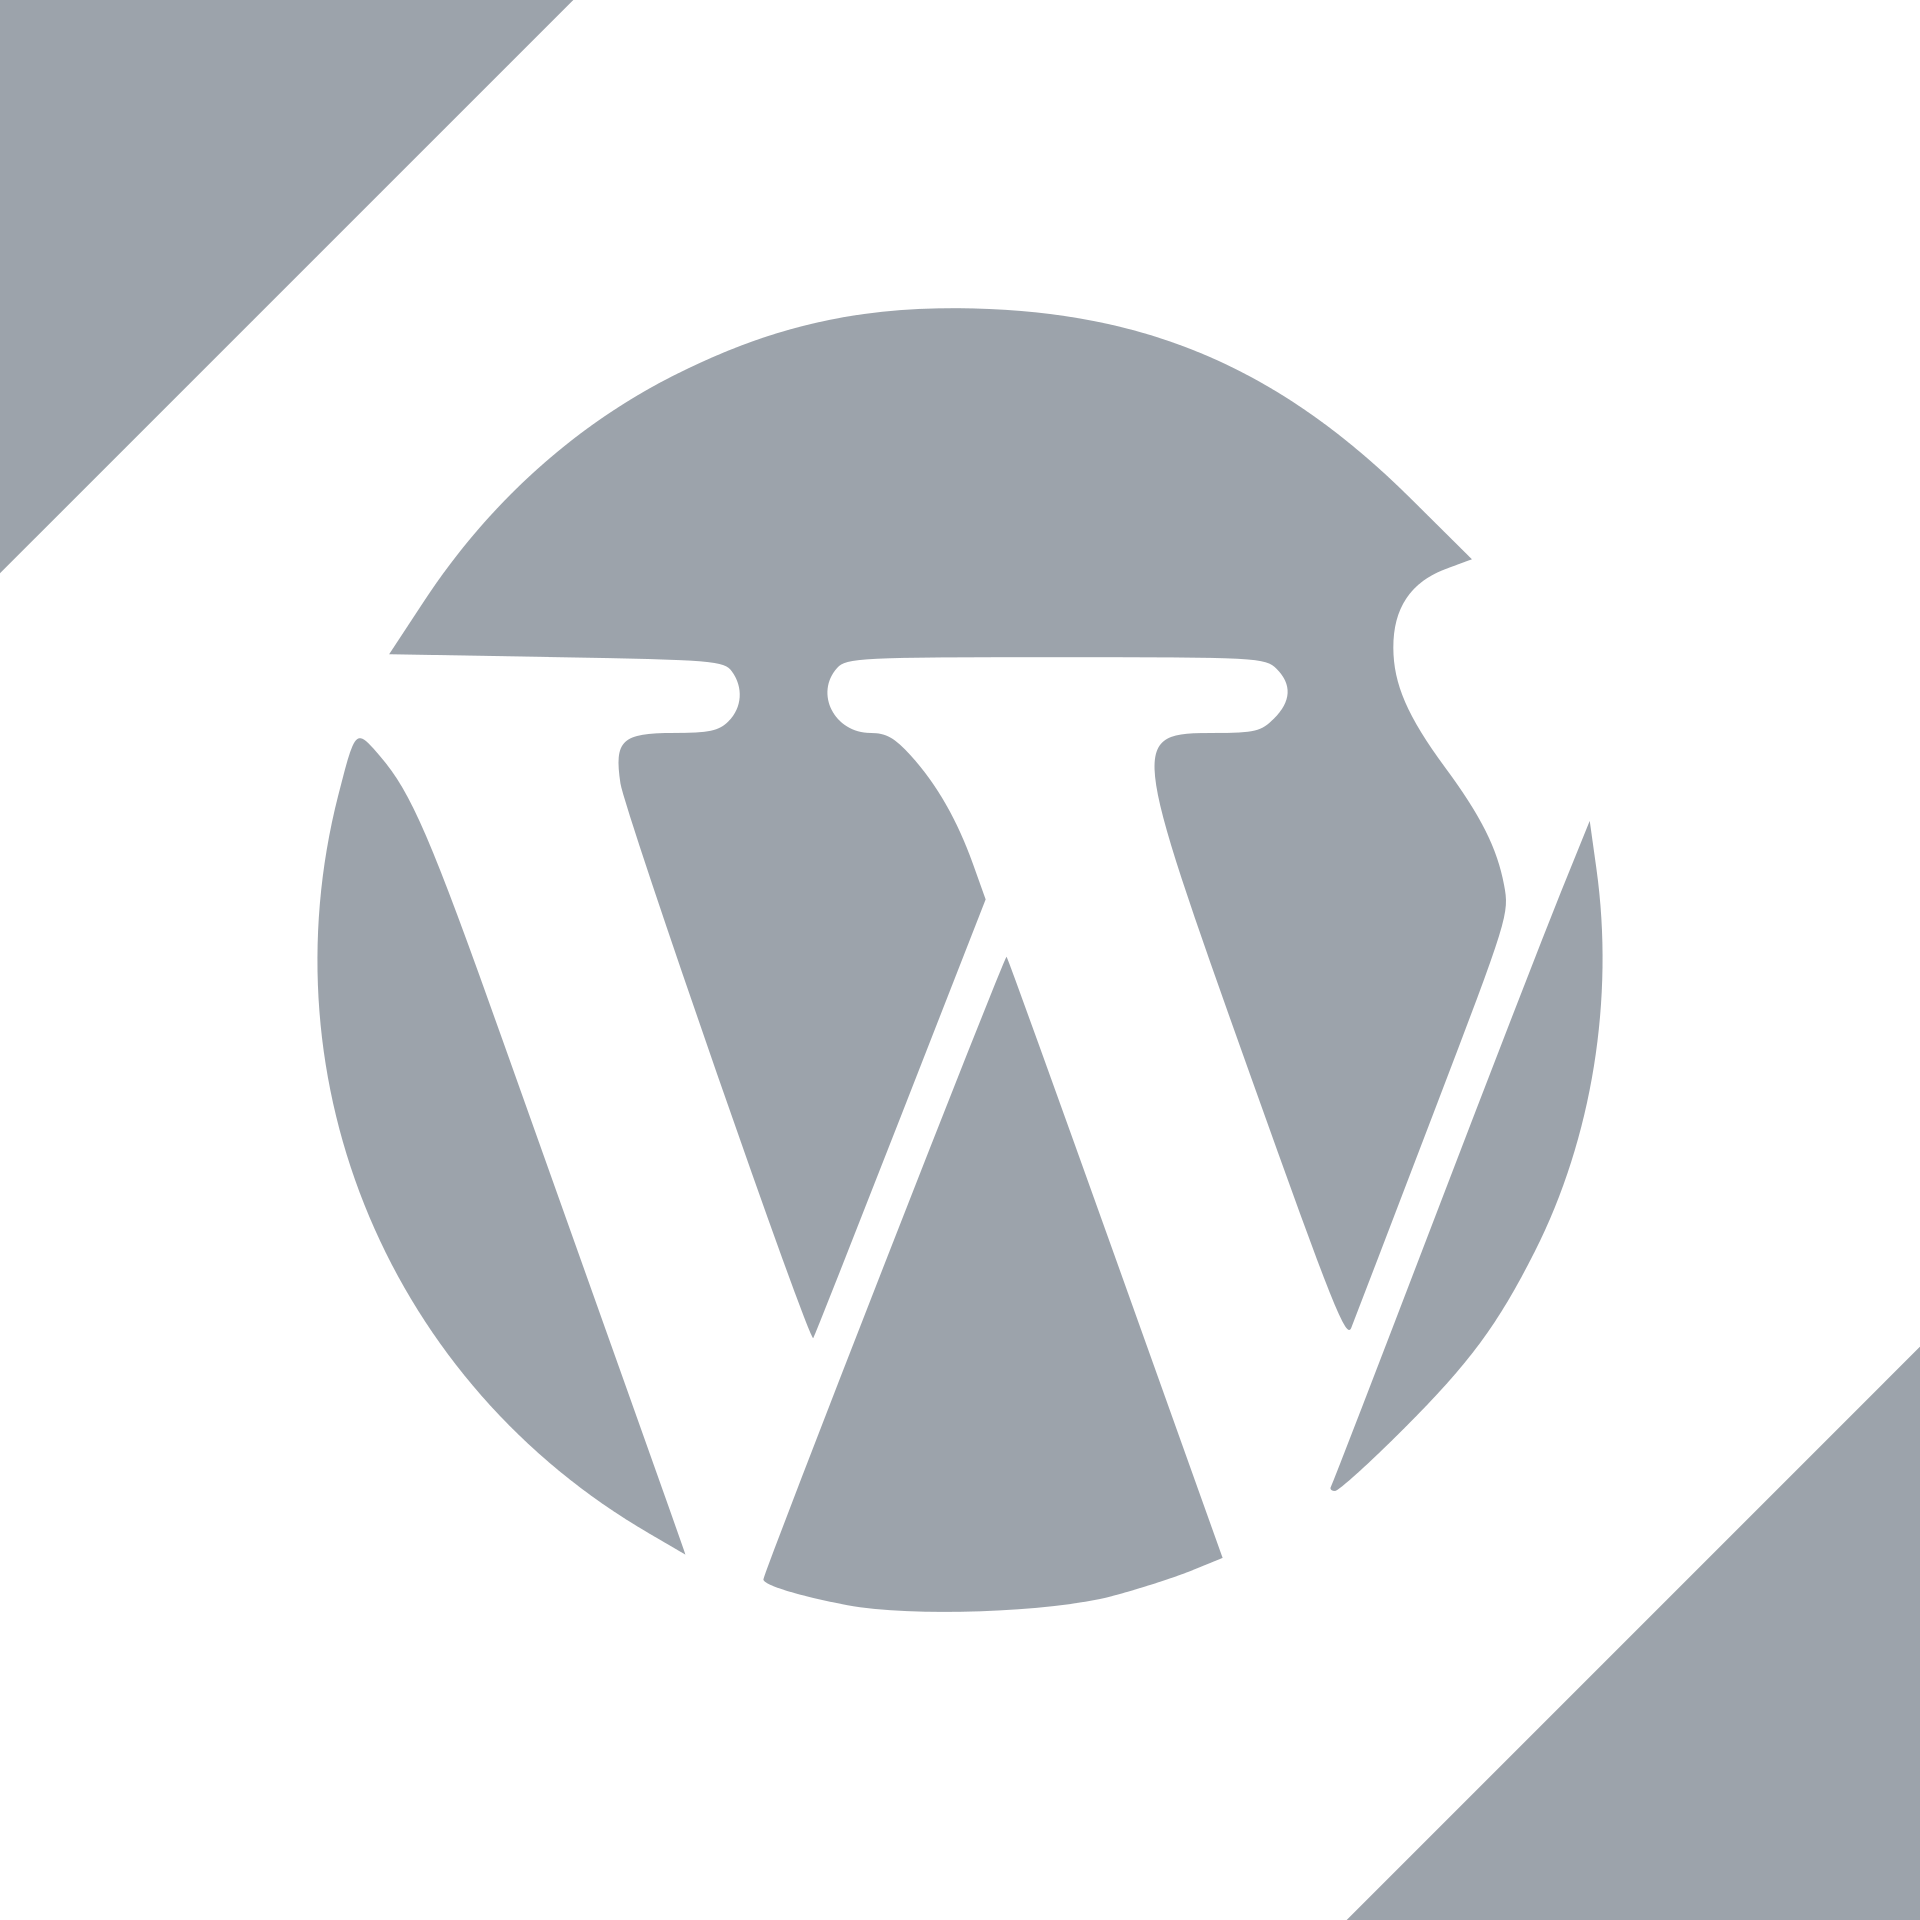 social 2470875 - wordpressでホームページを作成したい人向けの基礎知識とやり方まとめ